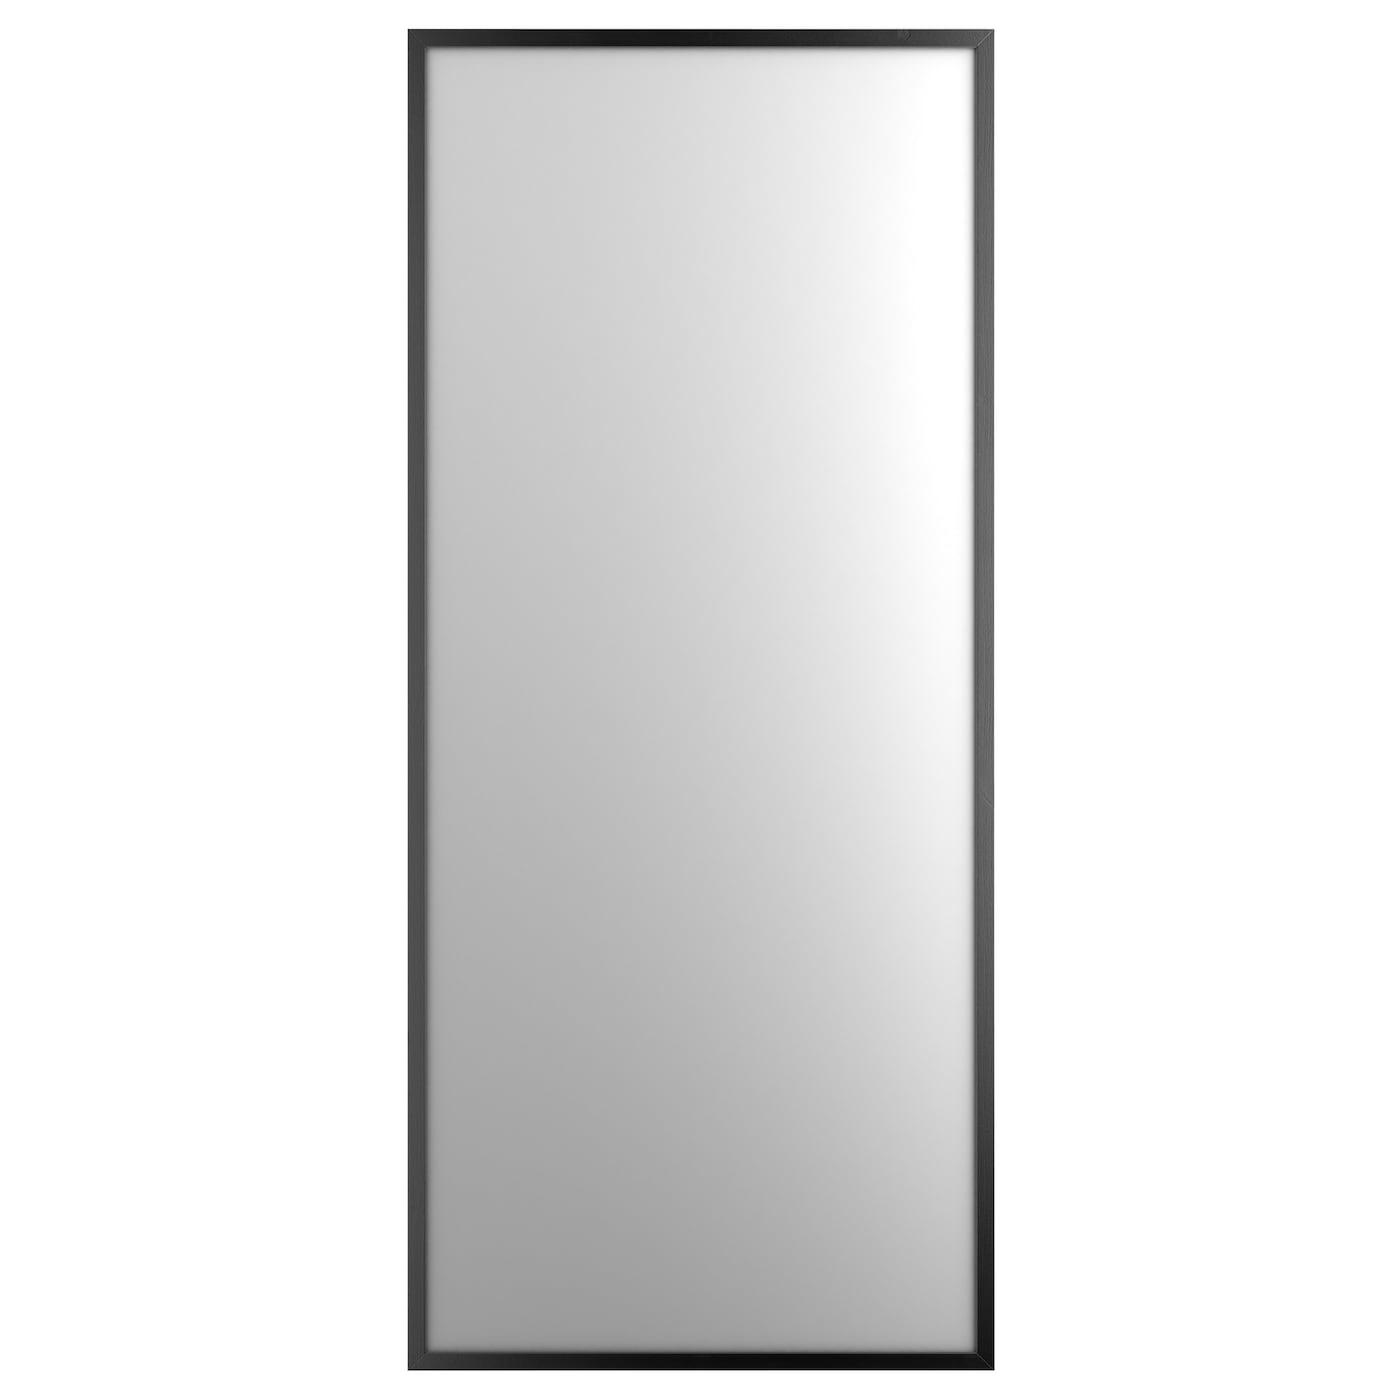 Stave mirror black brown 70x160 cm ikea for Miroir eclairant ikea